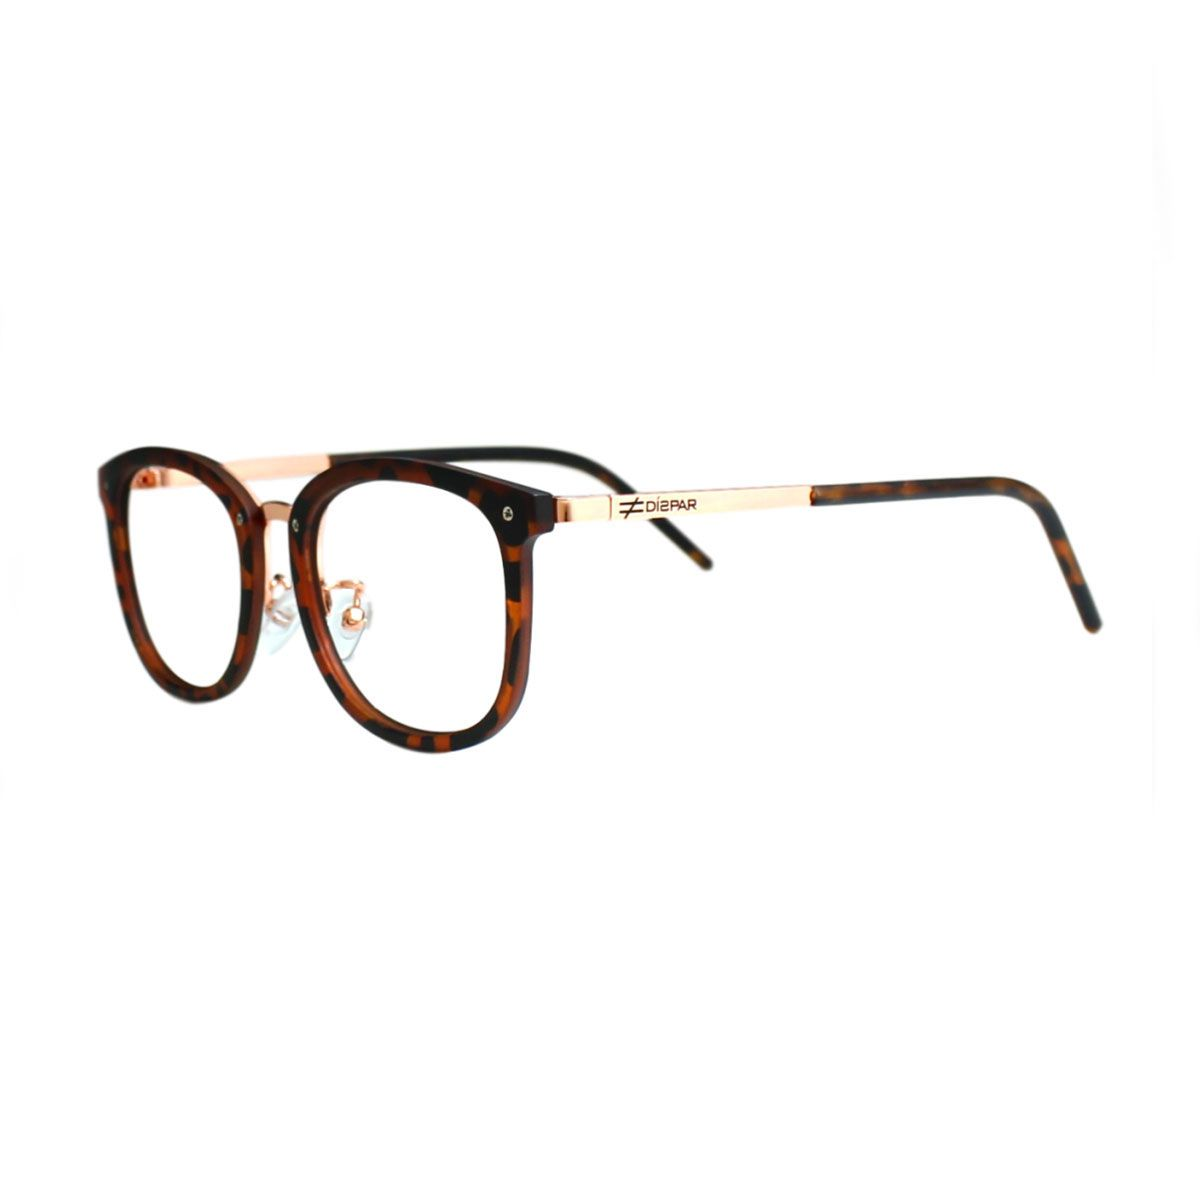 Armação para Óculos Díspar D2209 - Demi